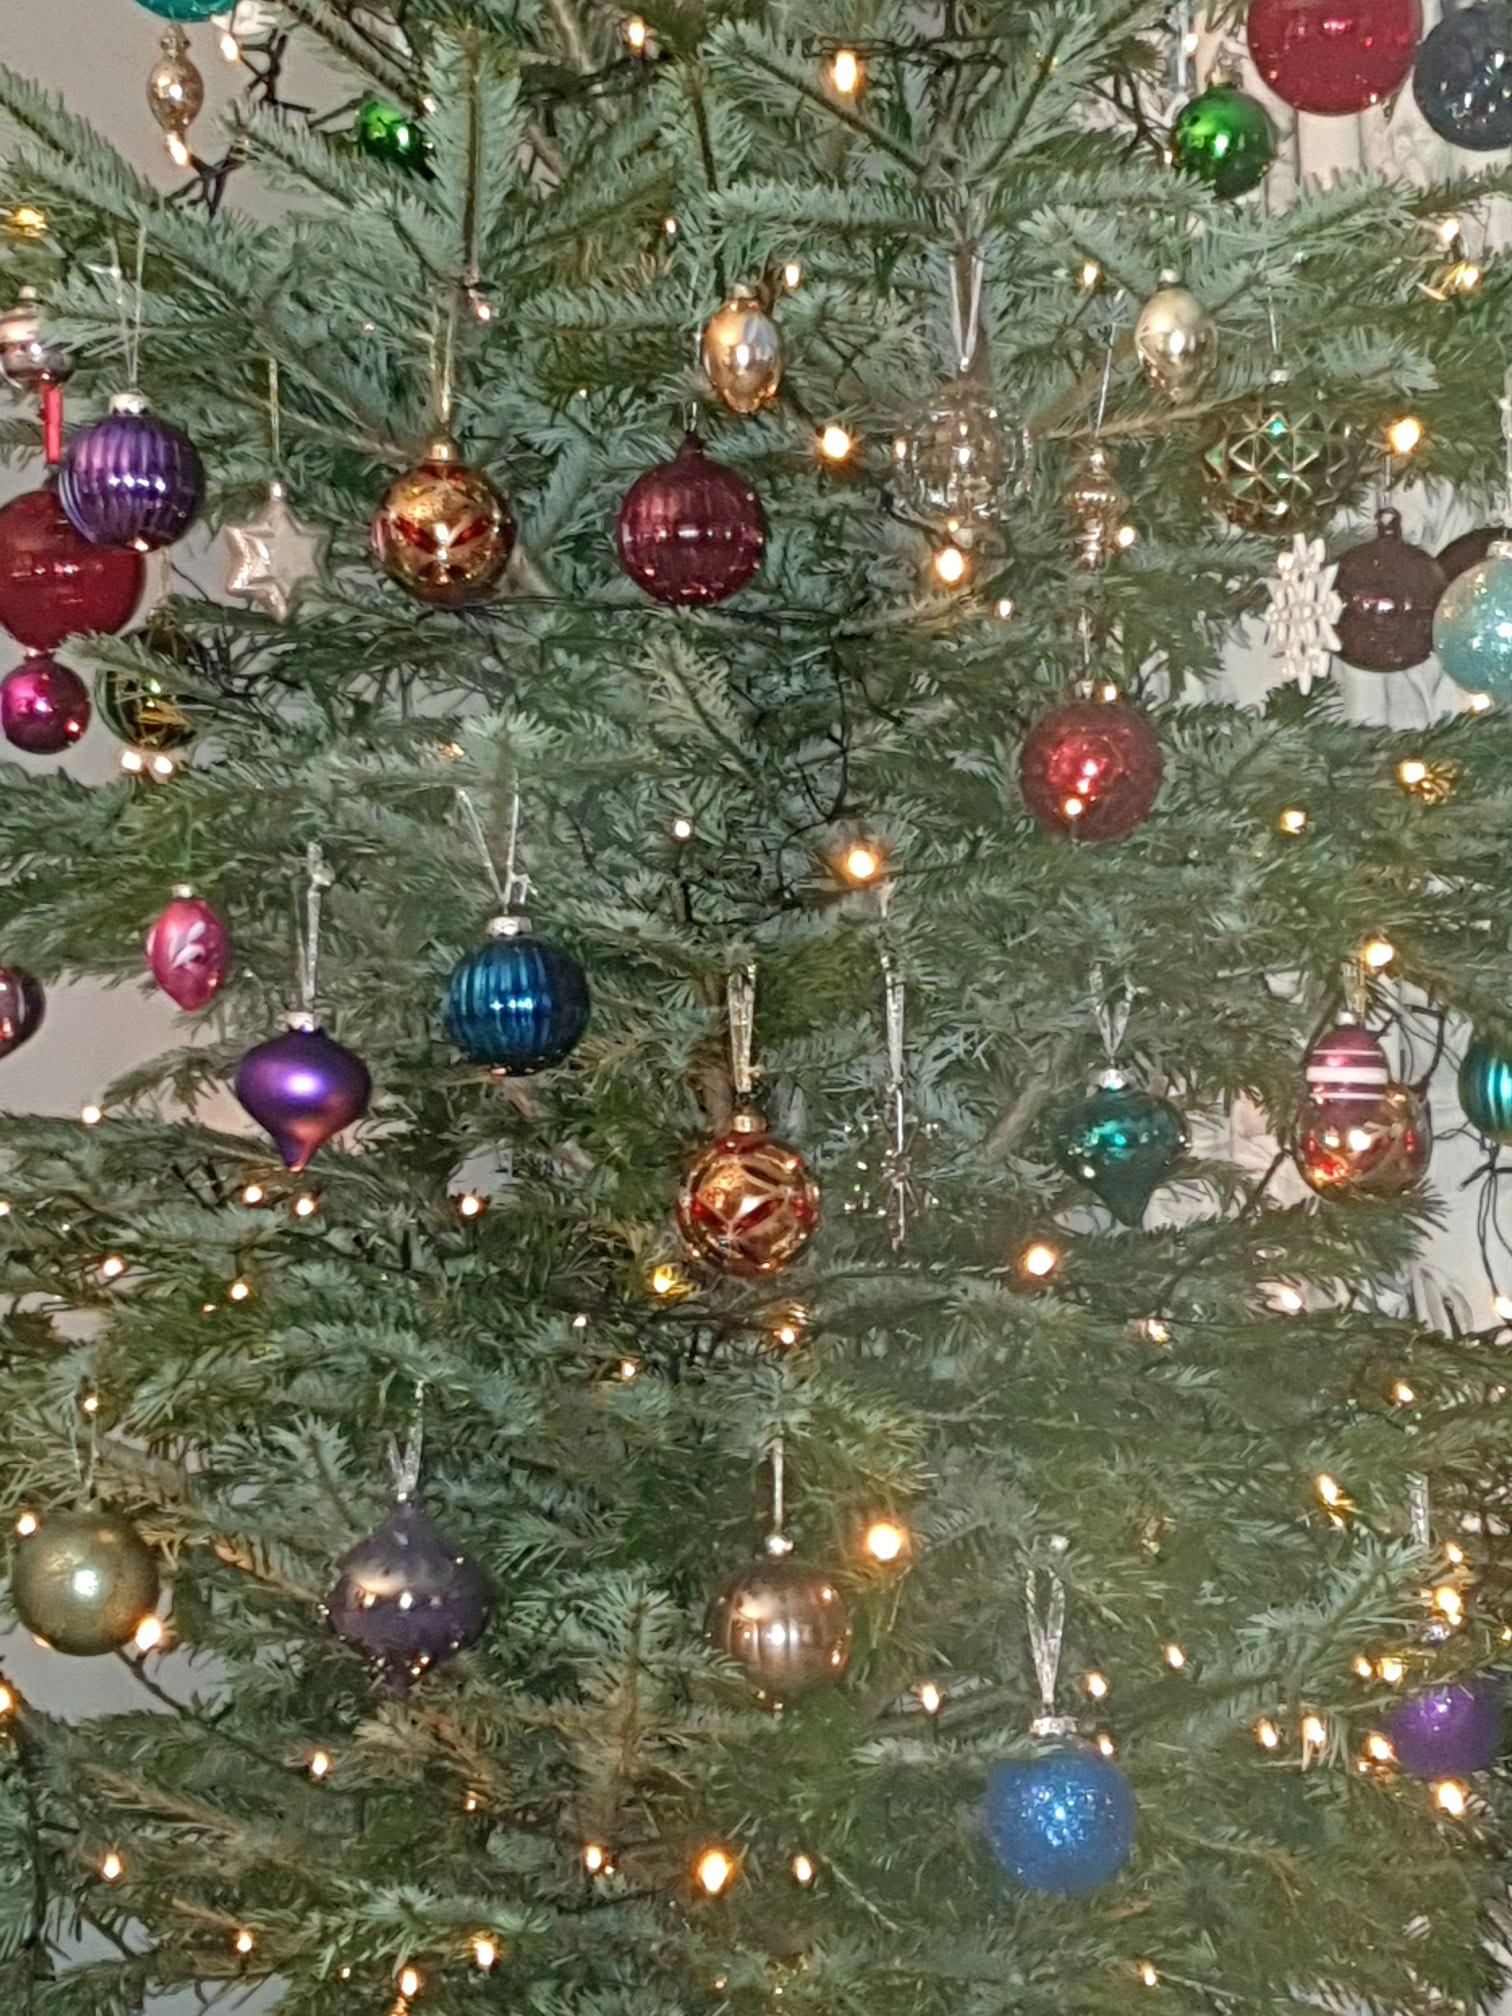 Real Christmas Trees - £3 Instore @ Homebase (Derbyshire)